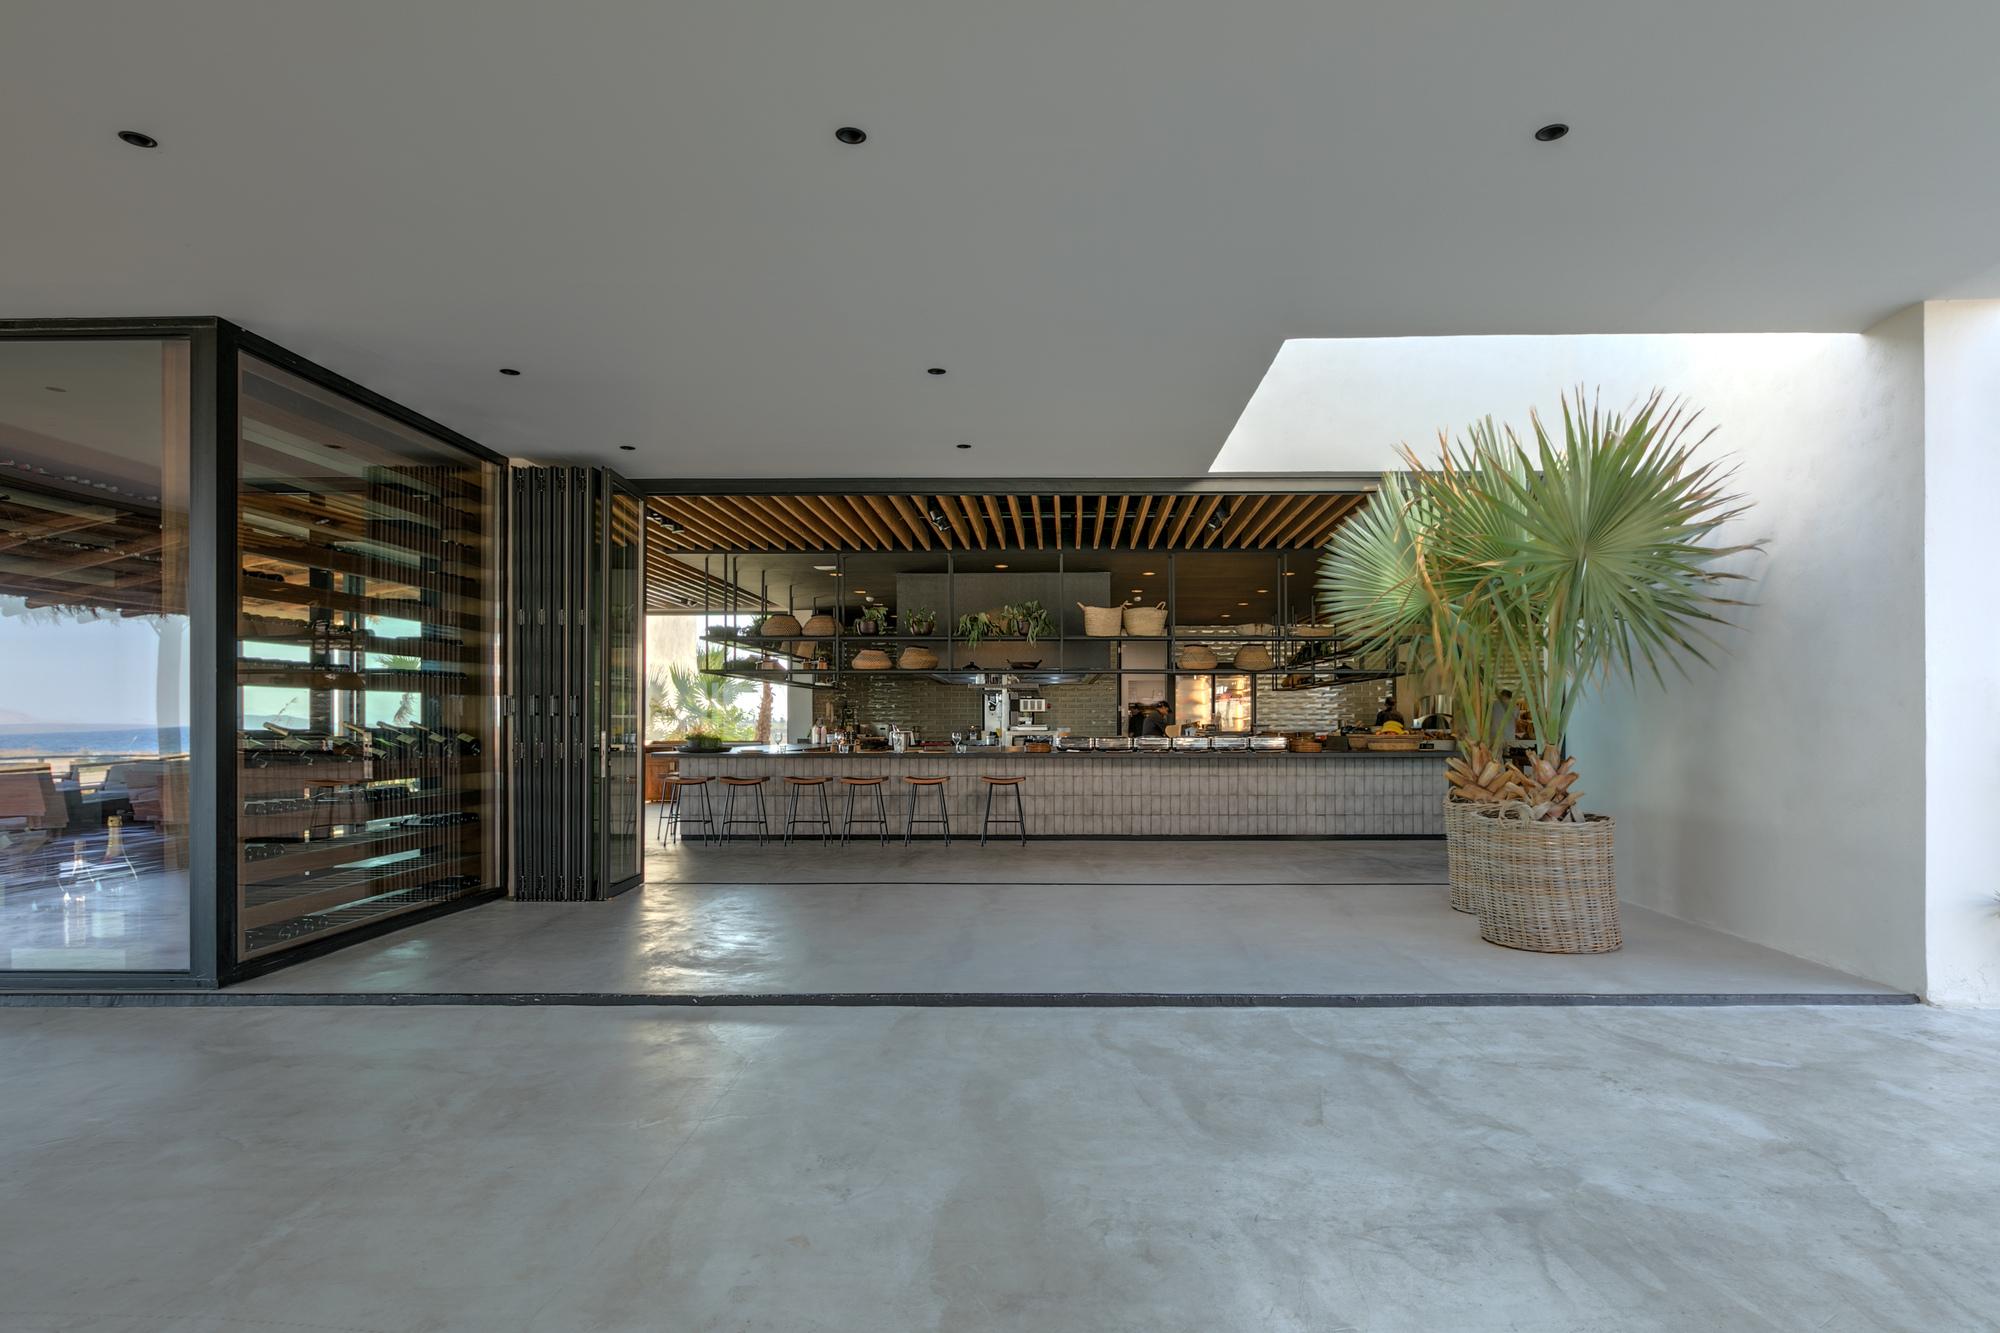 gallery of casa cook kos hotel mastrominas architecture 16. Black Bedroom Furniture Sets. Home Design Ideas